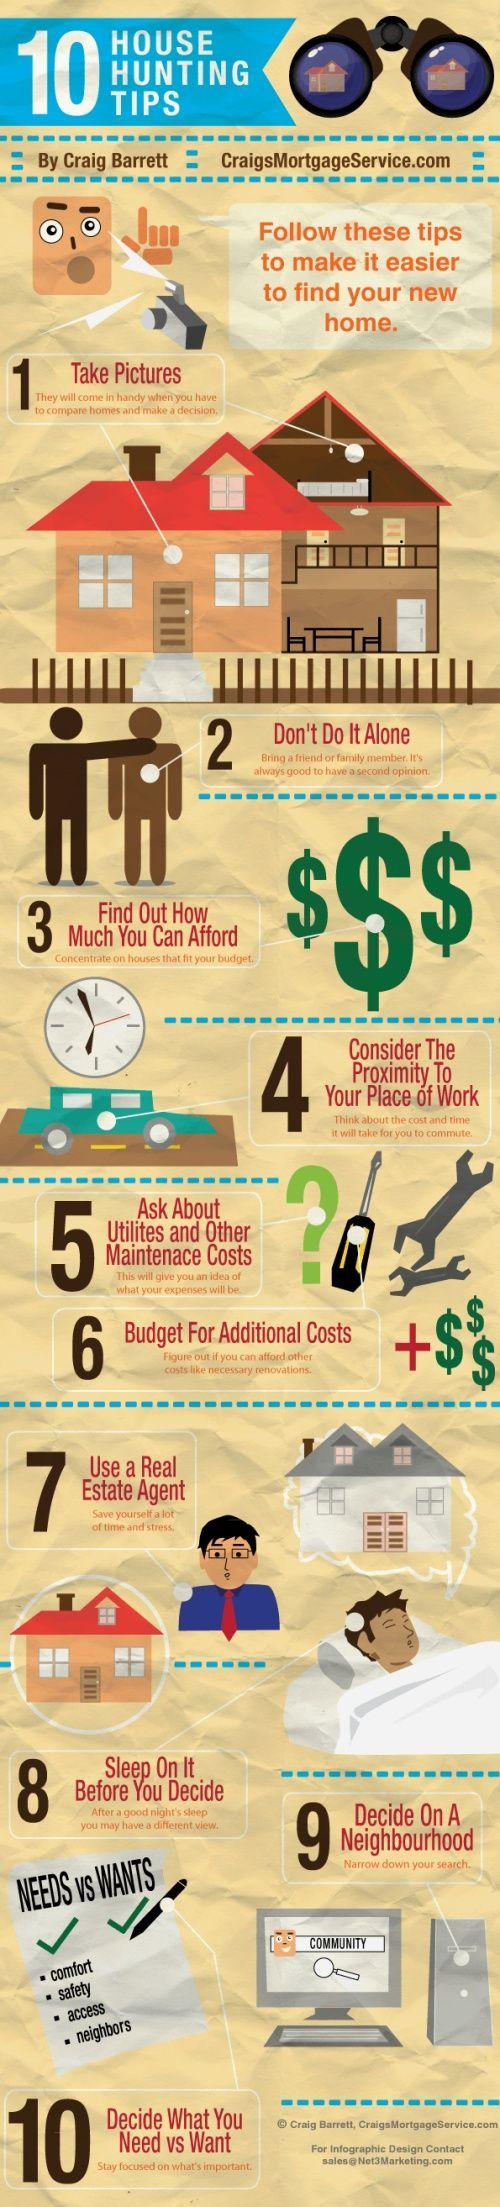 10 House Hunting Tips #ggve